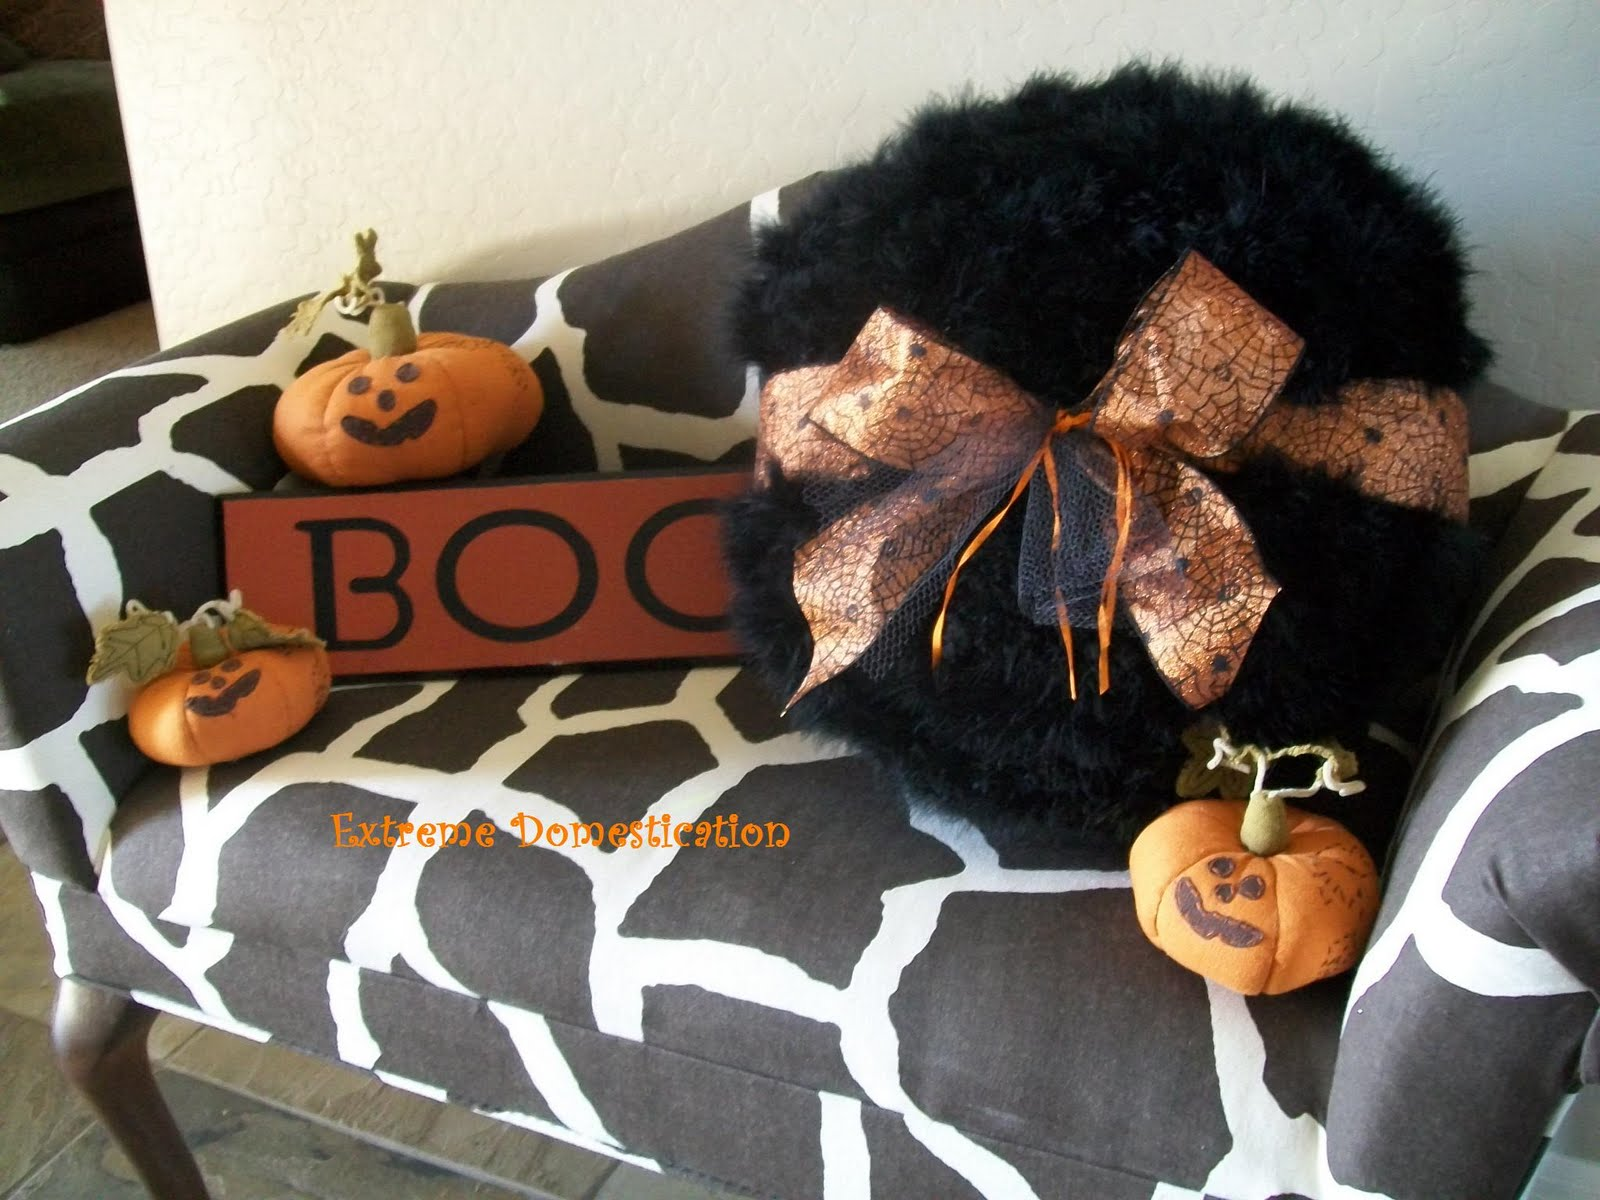 Extreme Domestication: Powder Puff Halloween Pillow